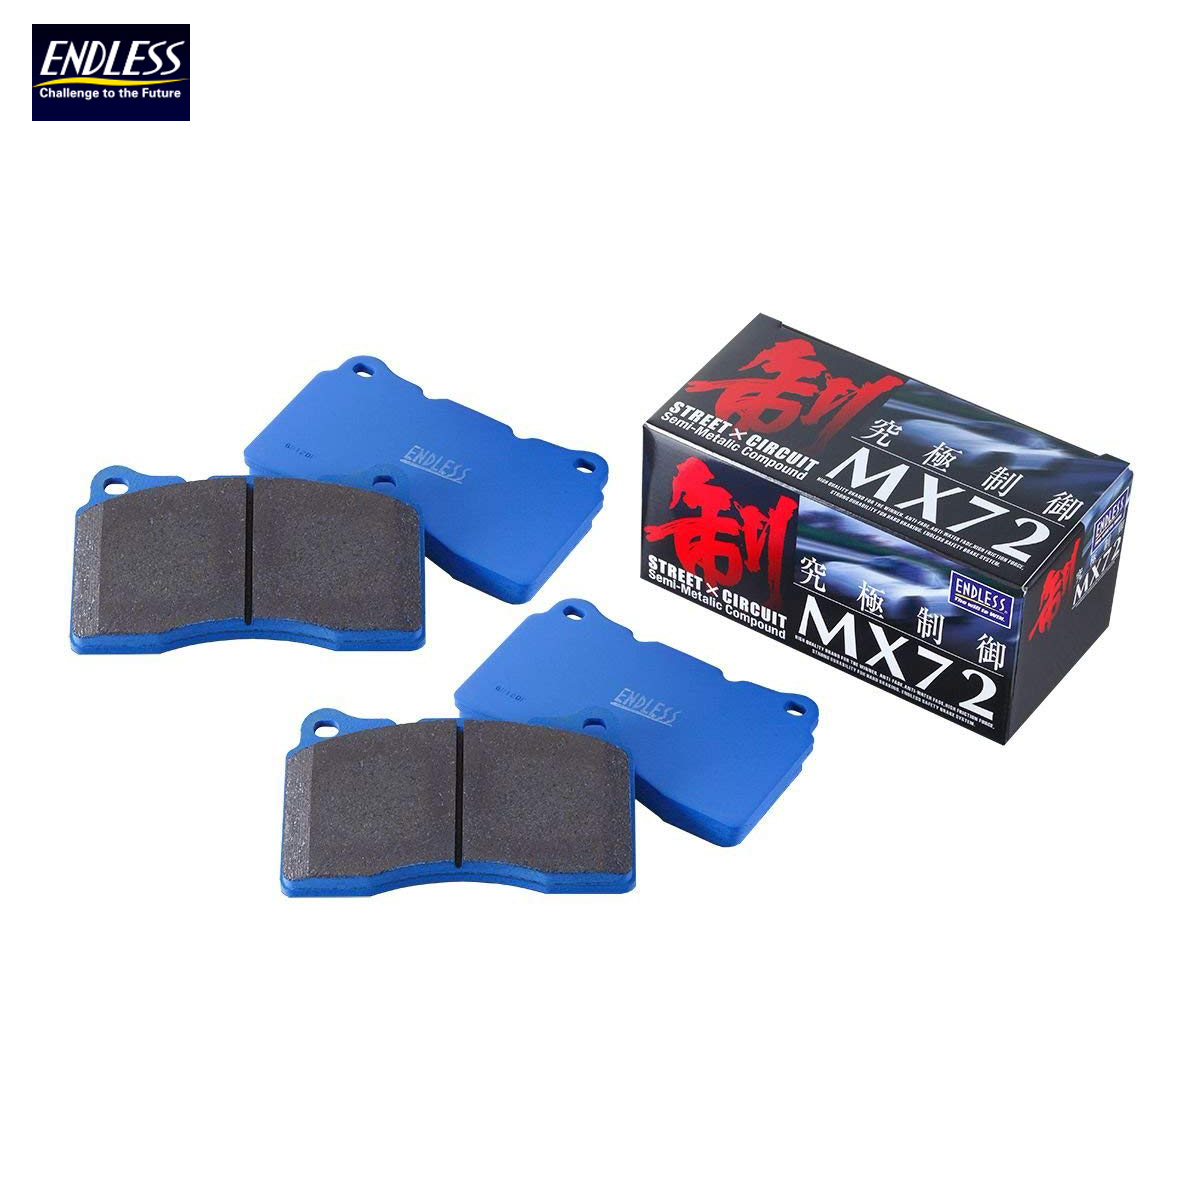 ENDLESS エンドレス ブレーキパッド MX72セット フロント EP449 リア EP509 ヴォクシー VOXY ZRR80G G X XCパッケージ 4輪ディスク